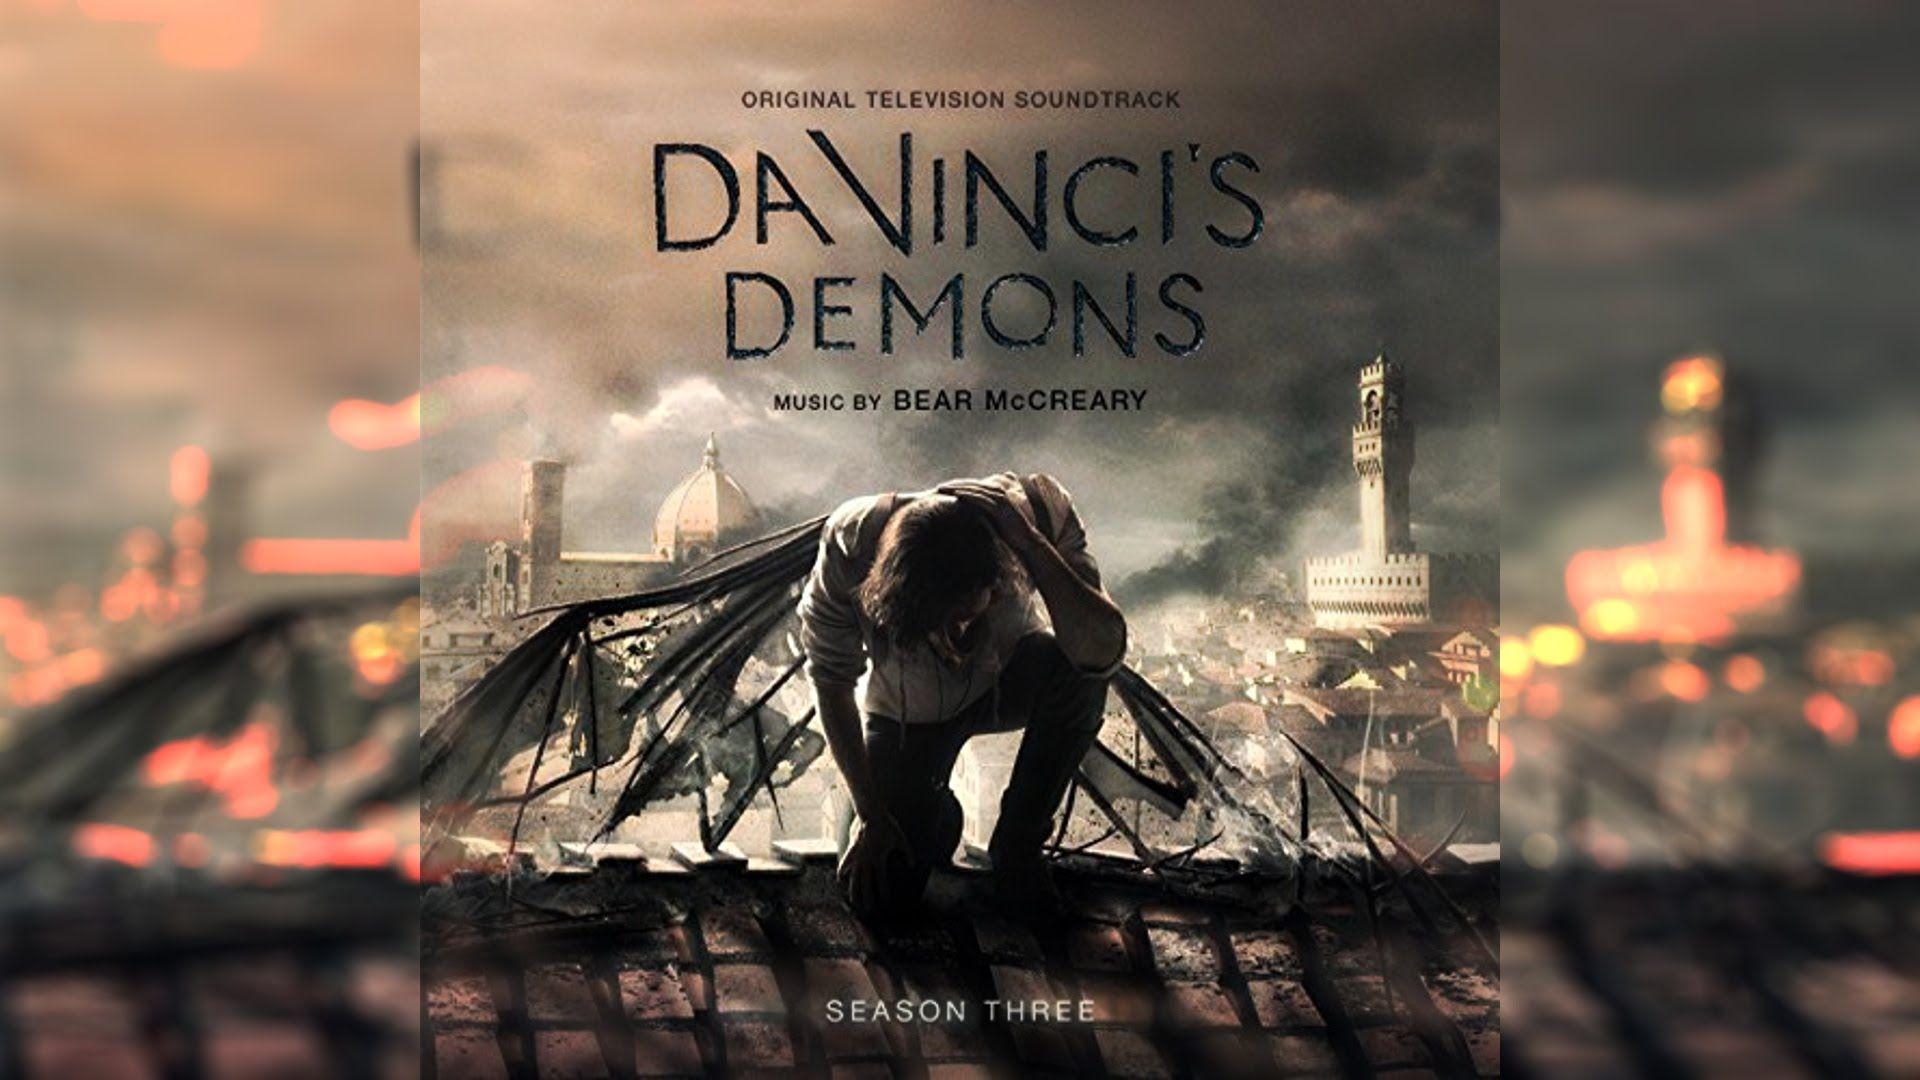 da vincis demons season 3 episode 1 download